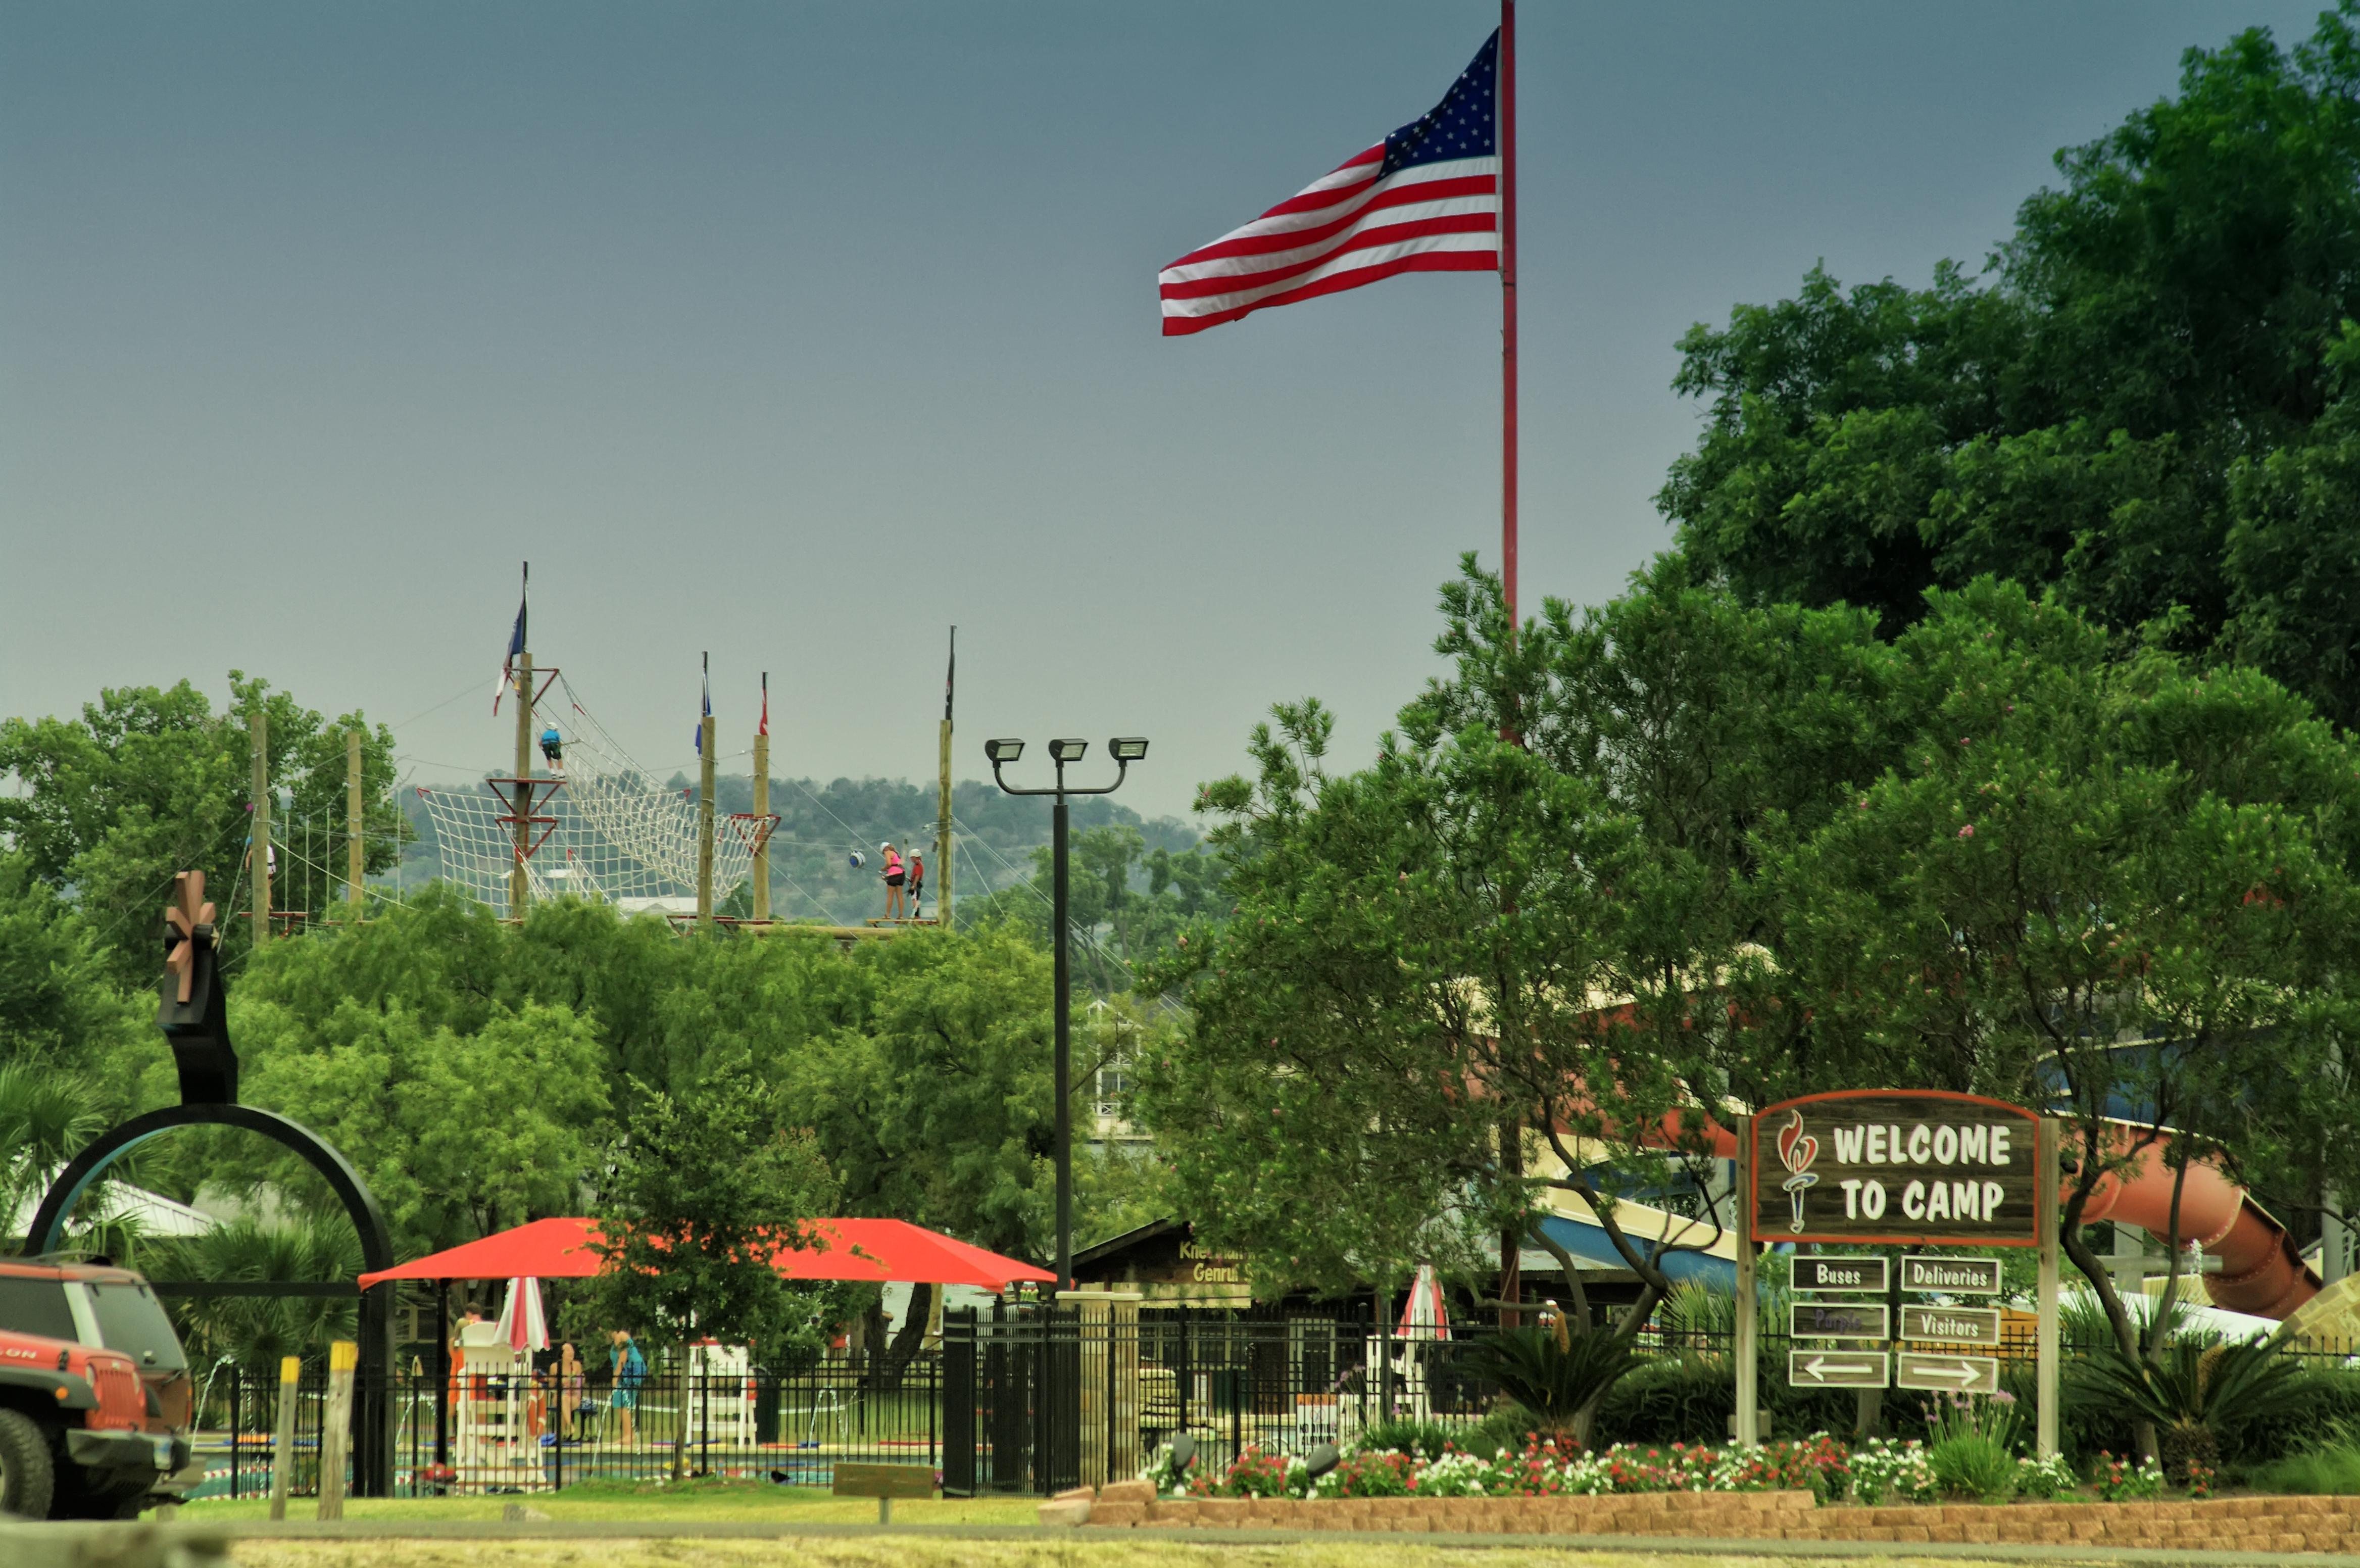 central-texas-summer-camp-champions-entrance.jpg